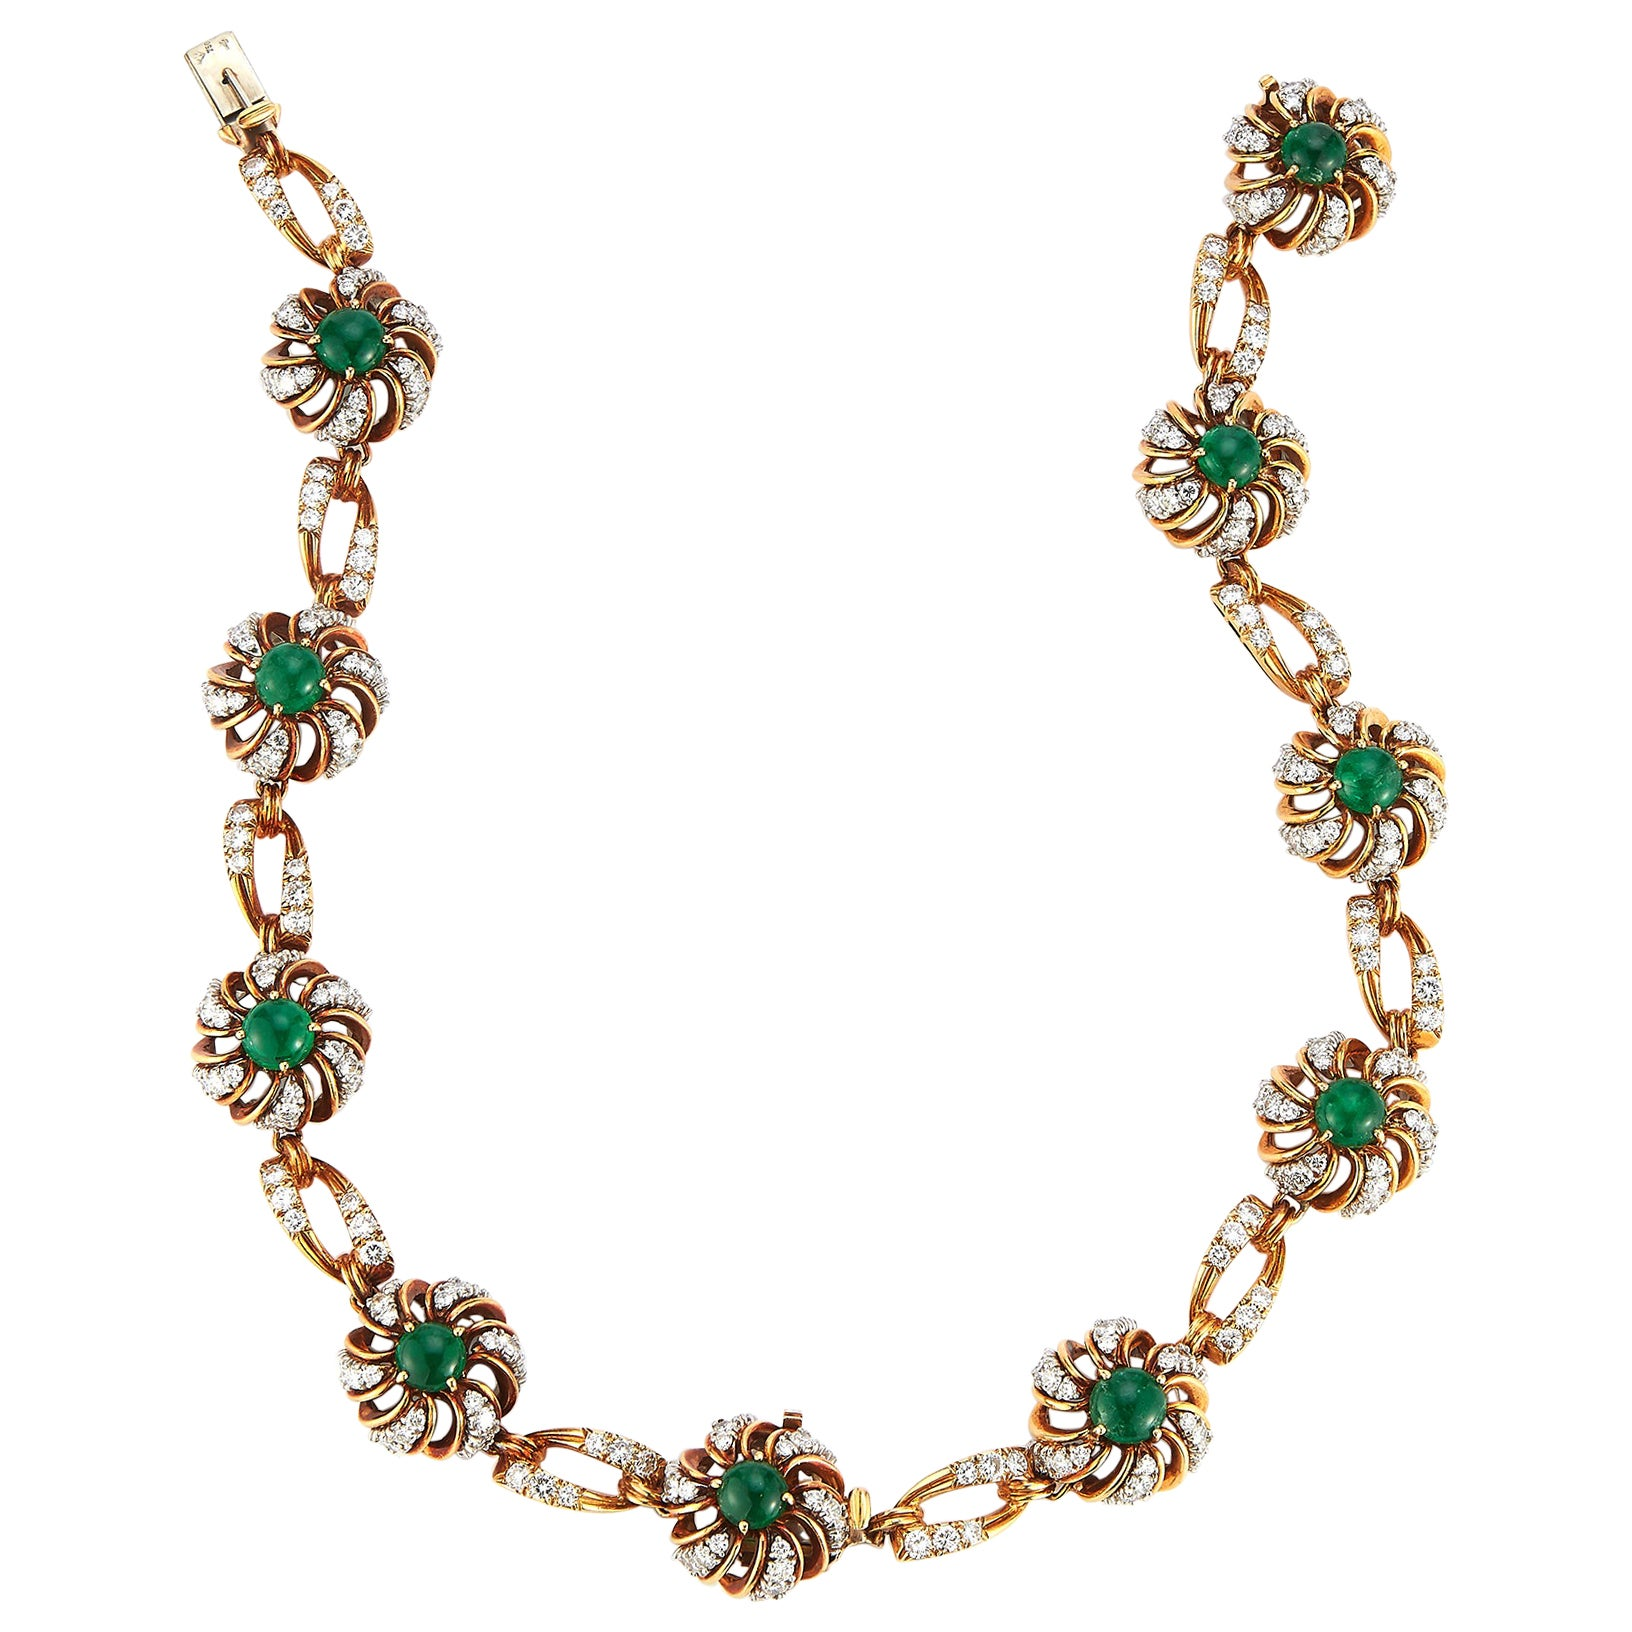 Cabochon Emerald & Diamond Flower Necklace